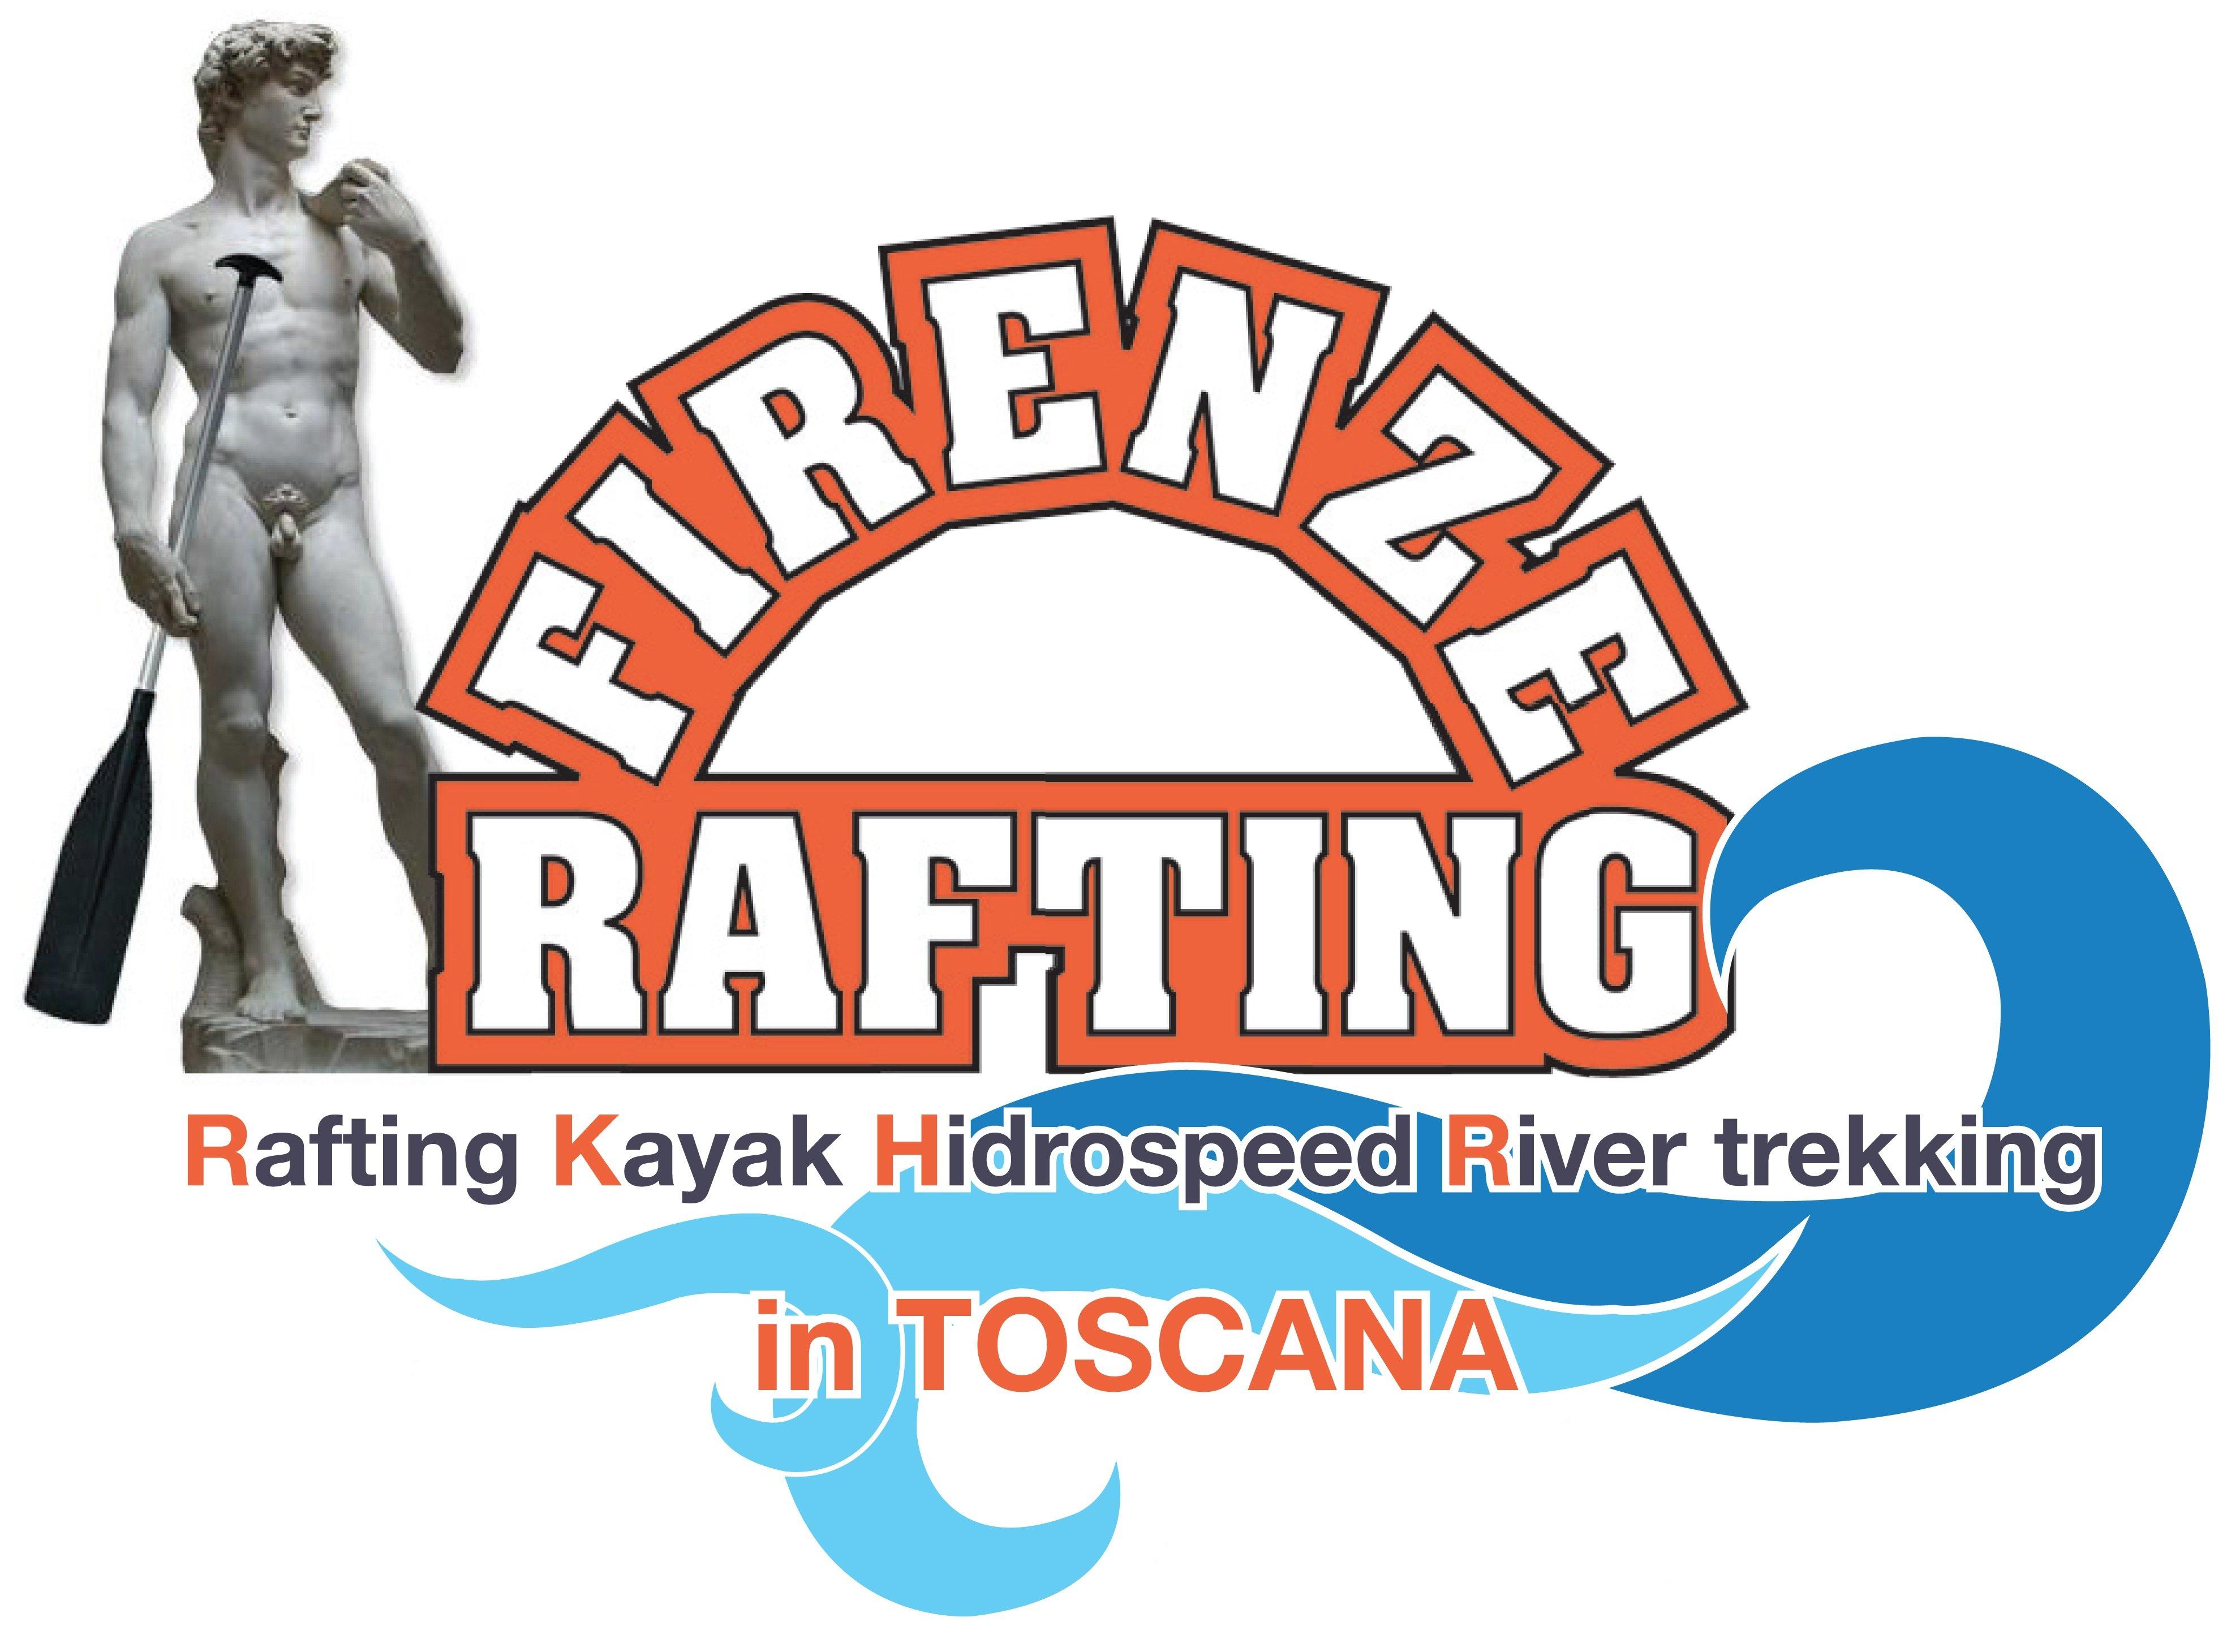 Firenze Rafting